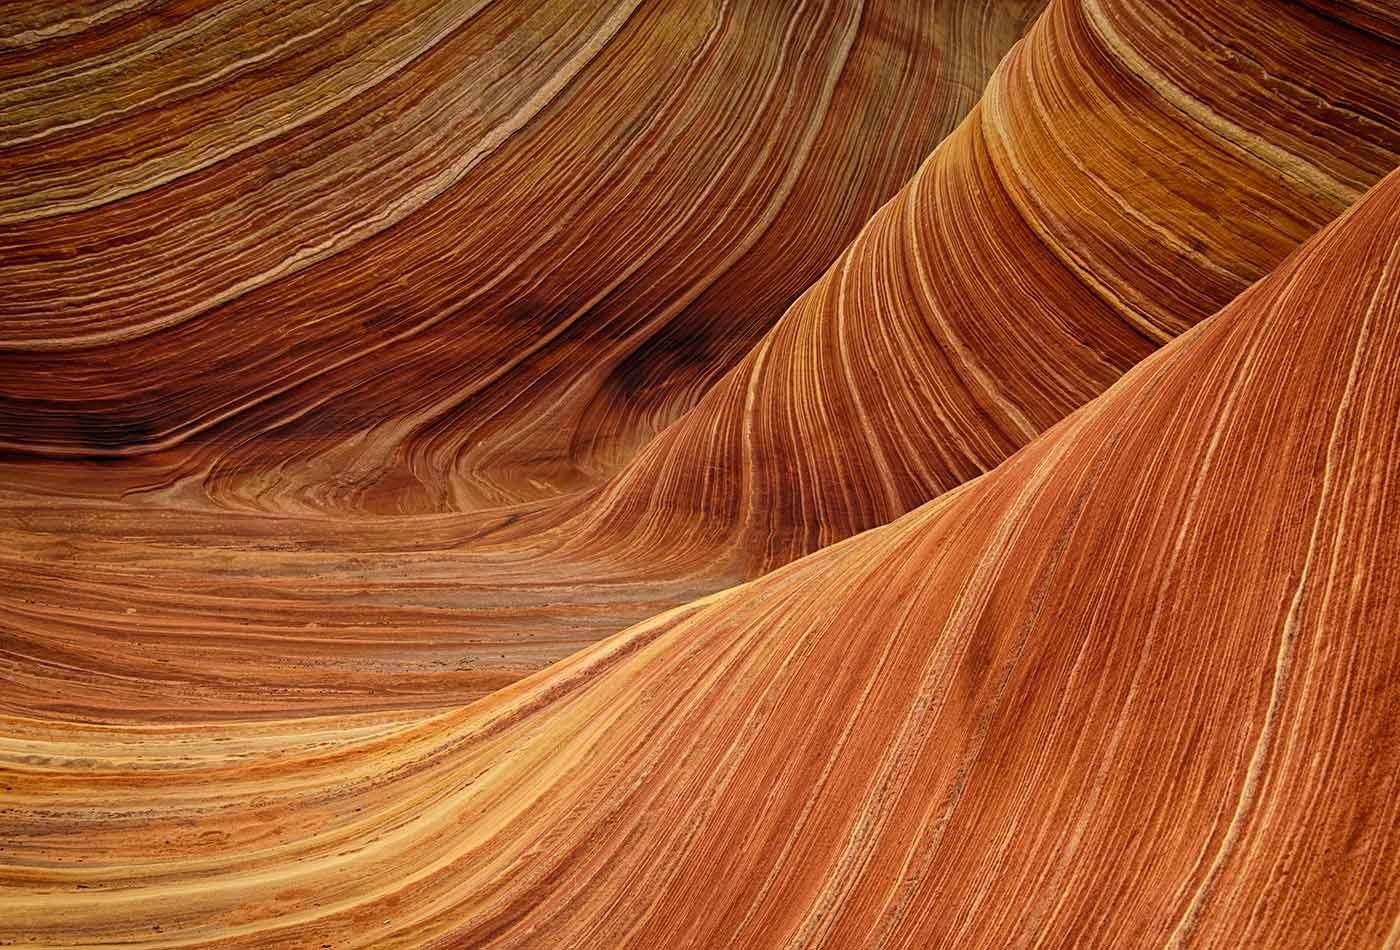 Sandstone wave.